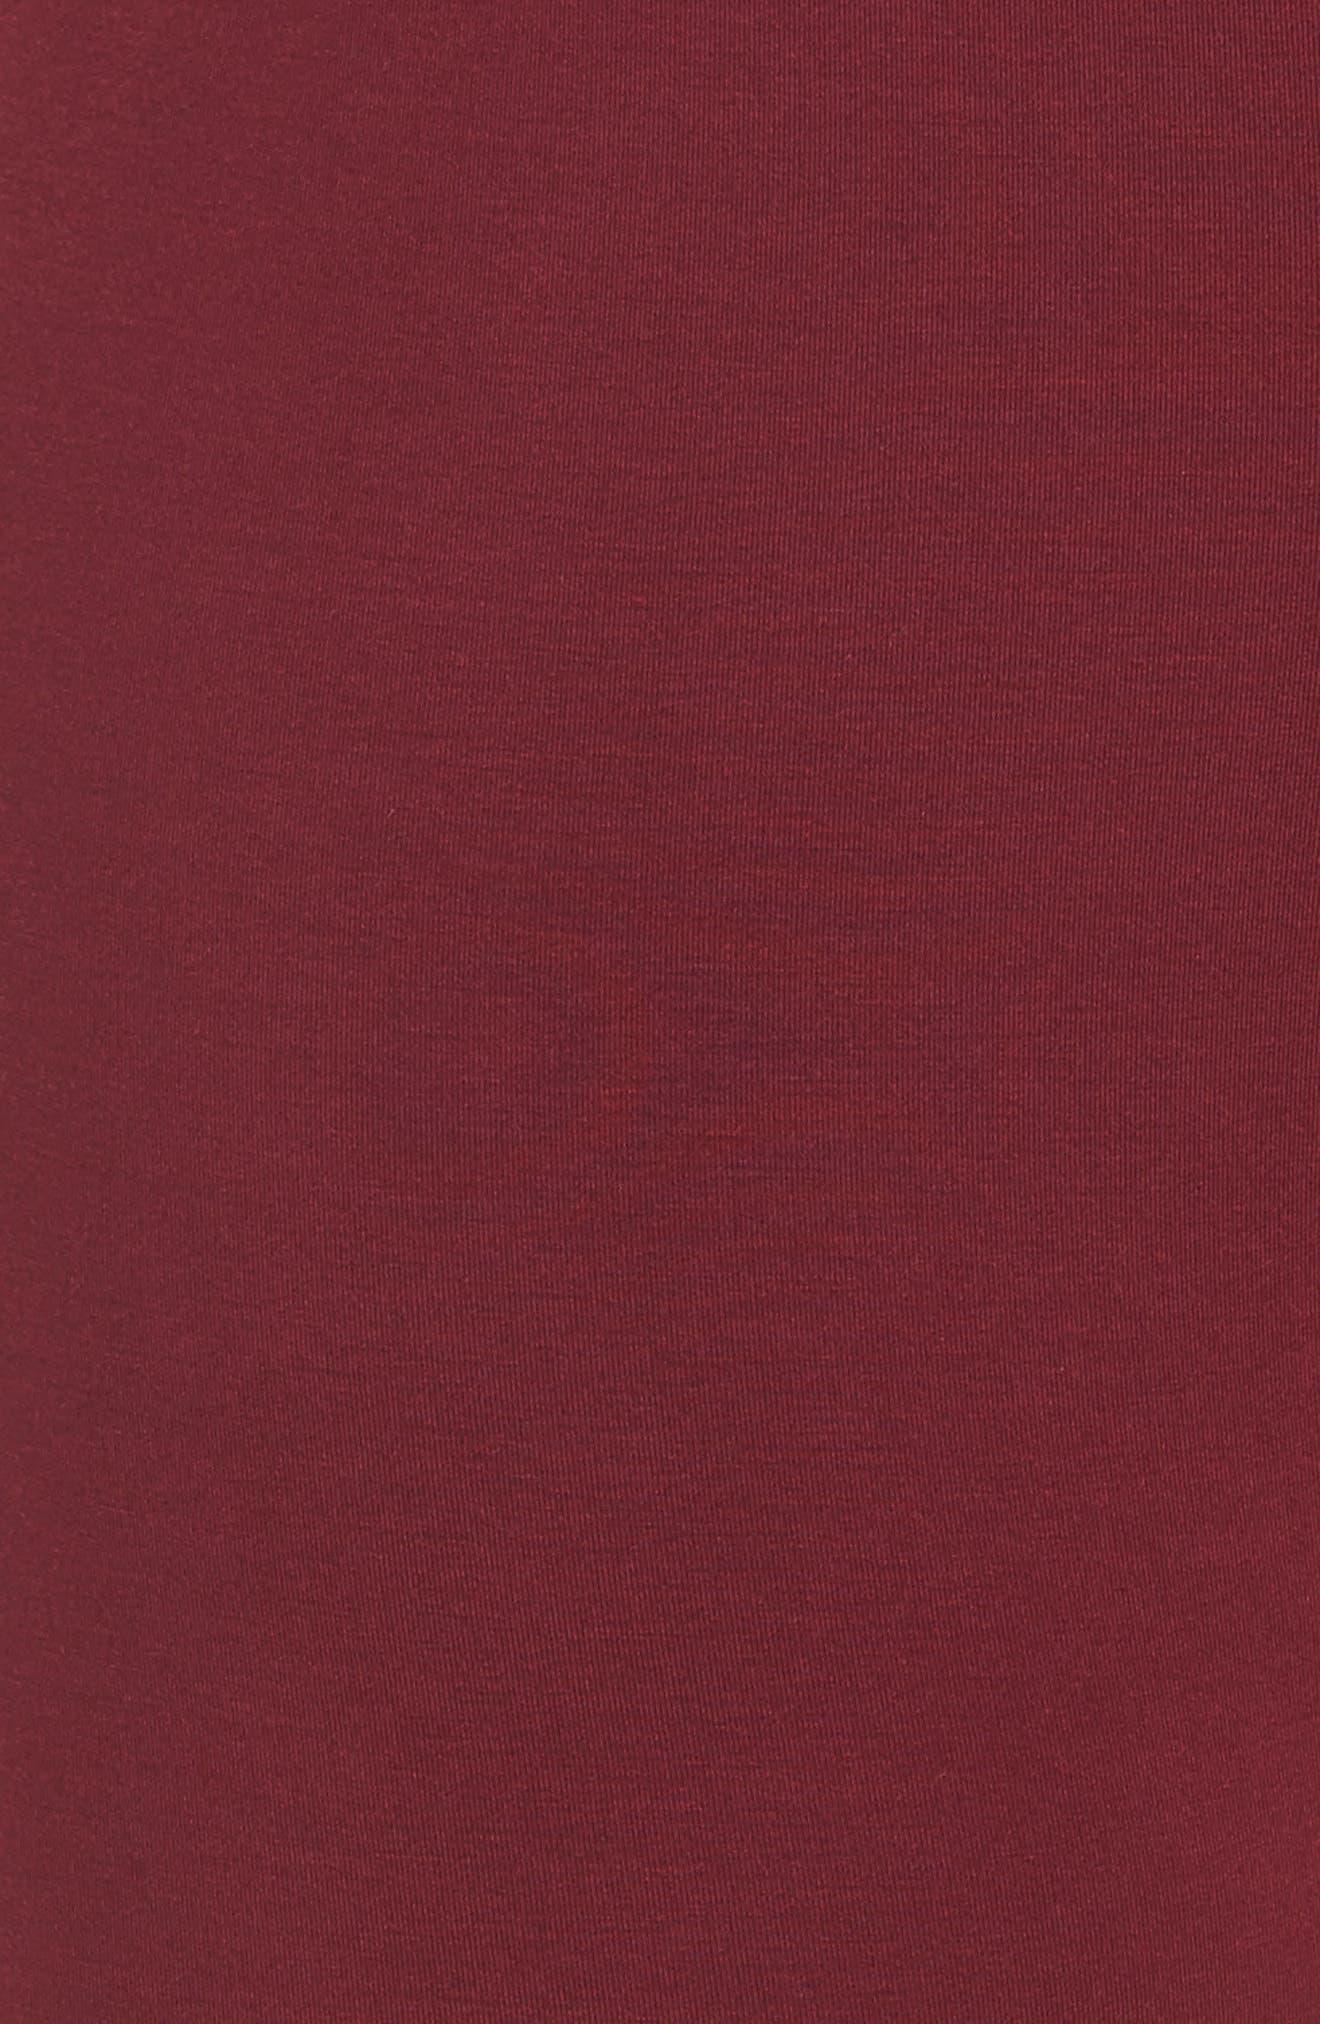 Lounge Pants,                             Alternate thumbnail 5, color,                             930